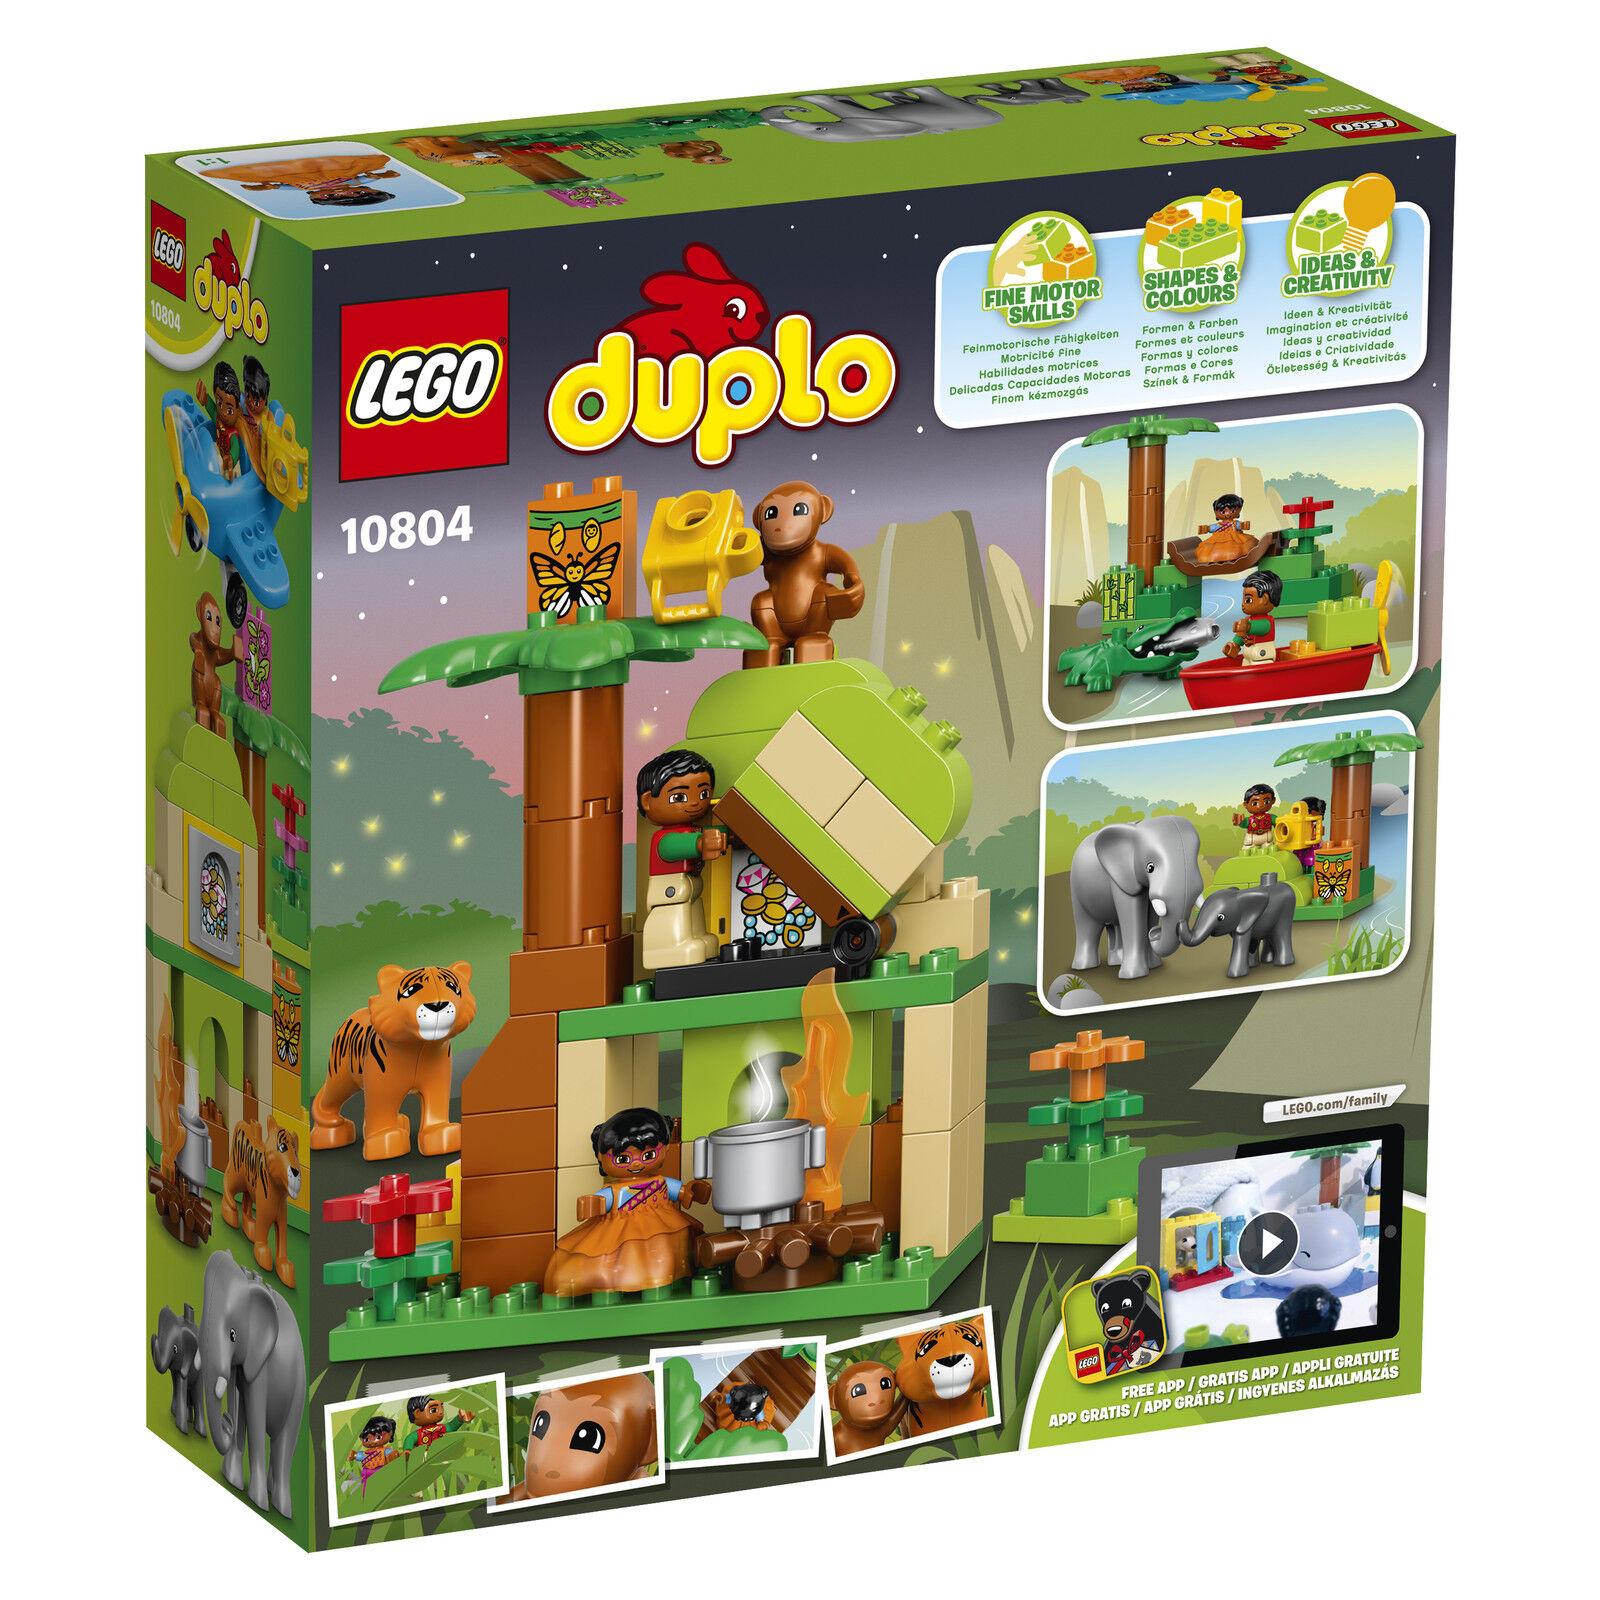 LEGO® DUPLO® 10804 Dschungel NEU OVP_ Jungle NEW NEW NEW MISB NRFB fea57d